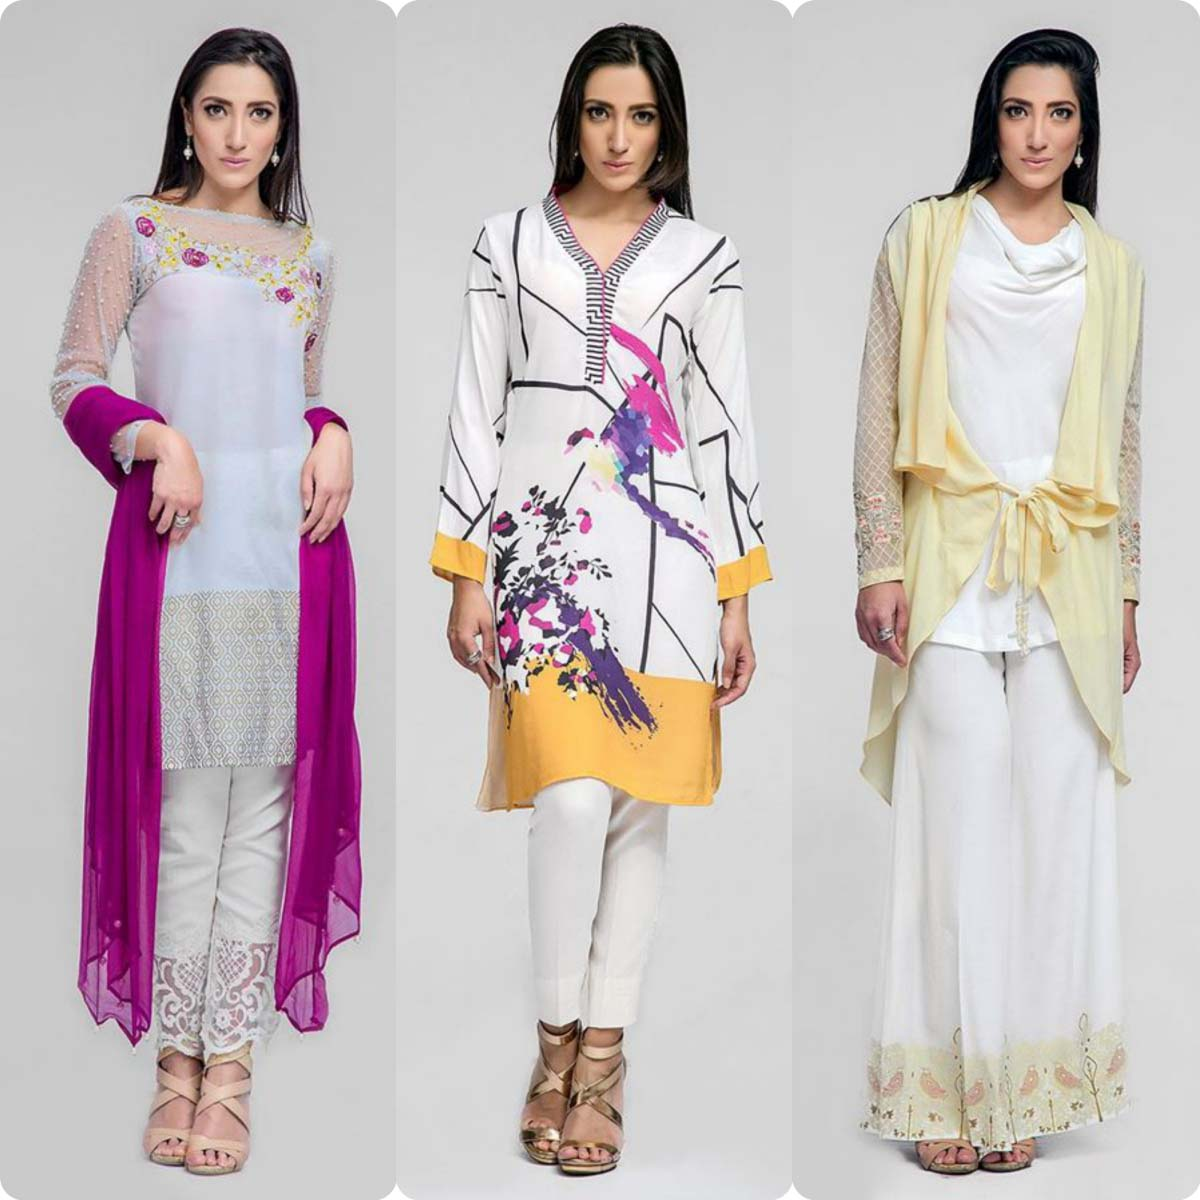 Deepak perwani Luxury Pret Eid Collection for Men and Women 2016-2017 (13)